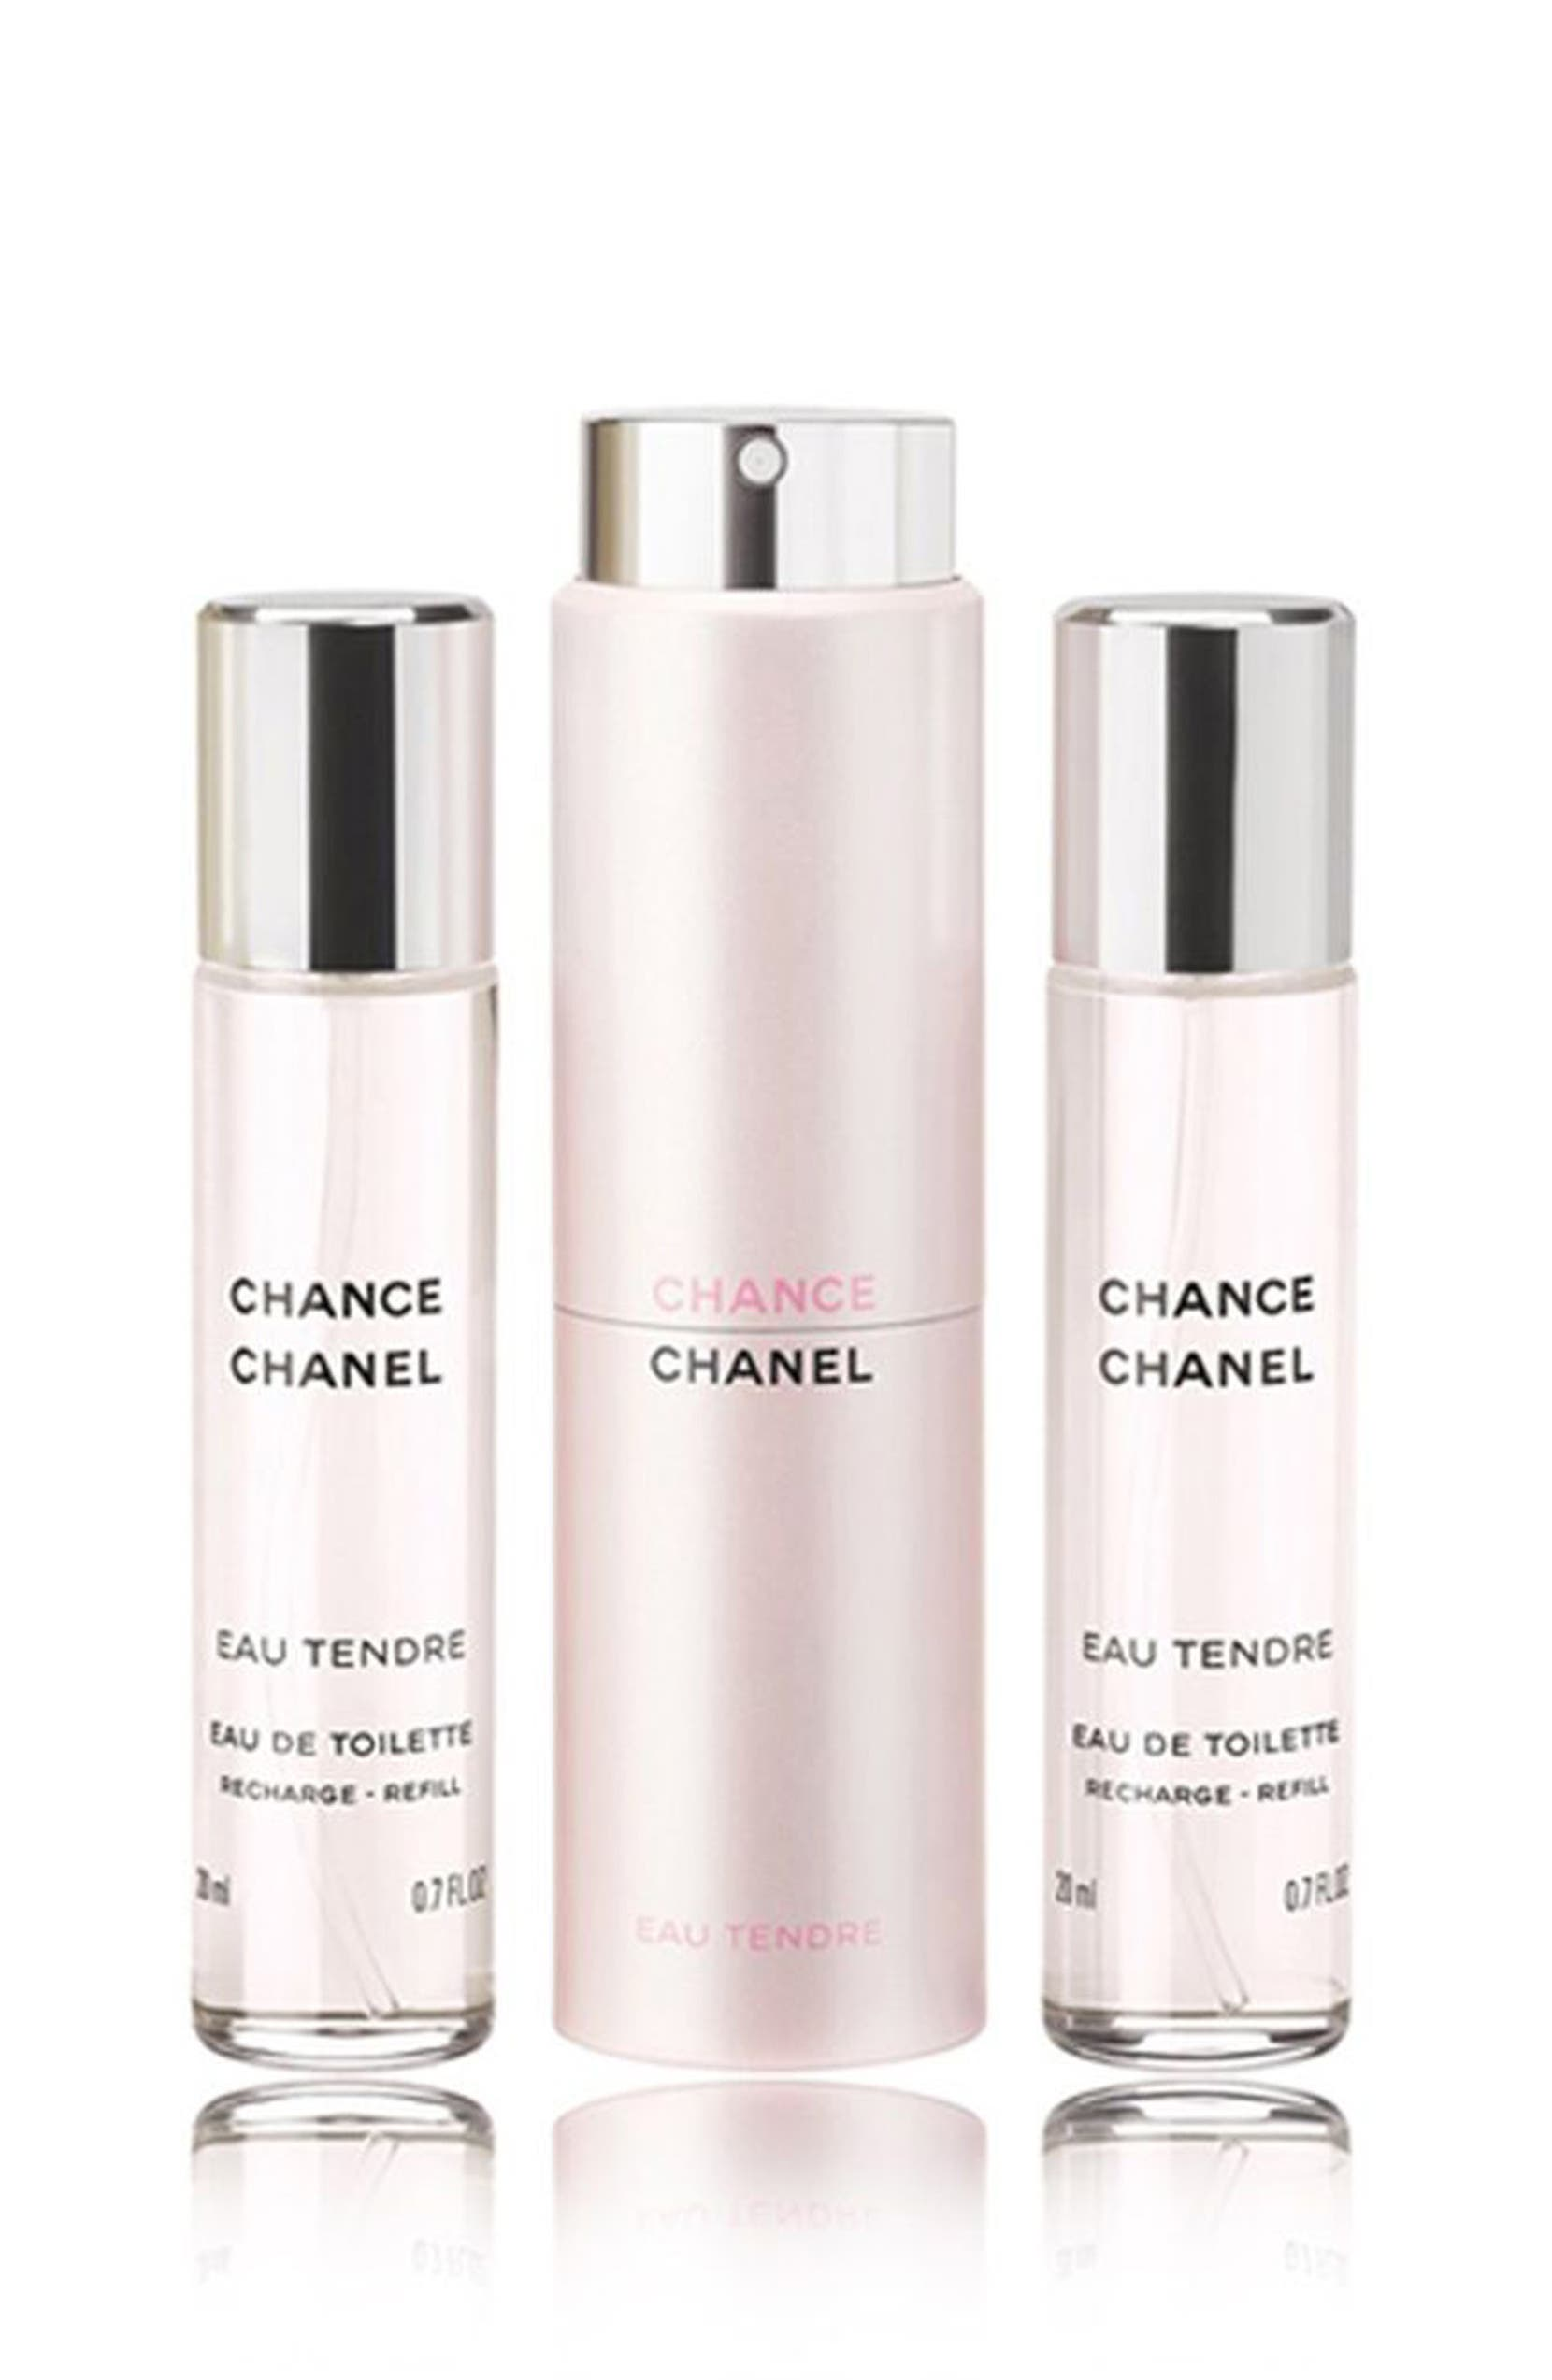 fd86c677 CHANCE EAU TENDRE Eau de Toilette Twist & Spray